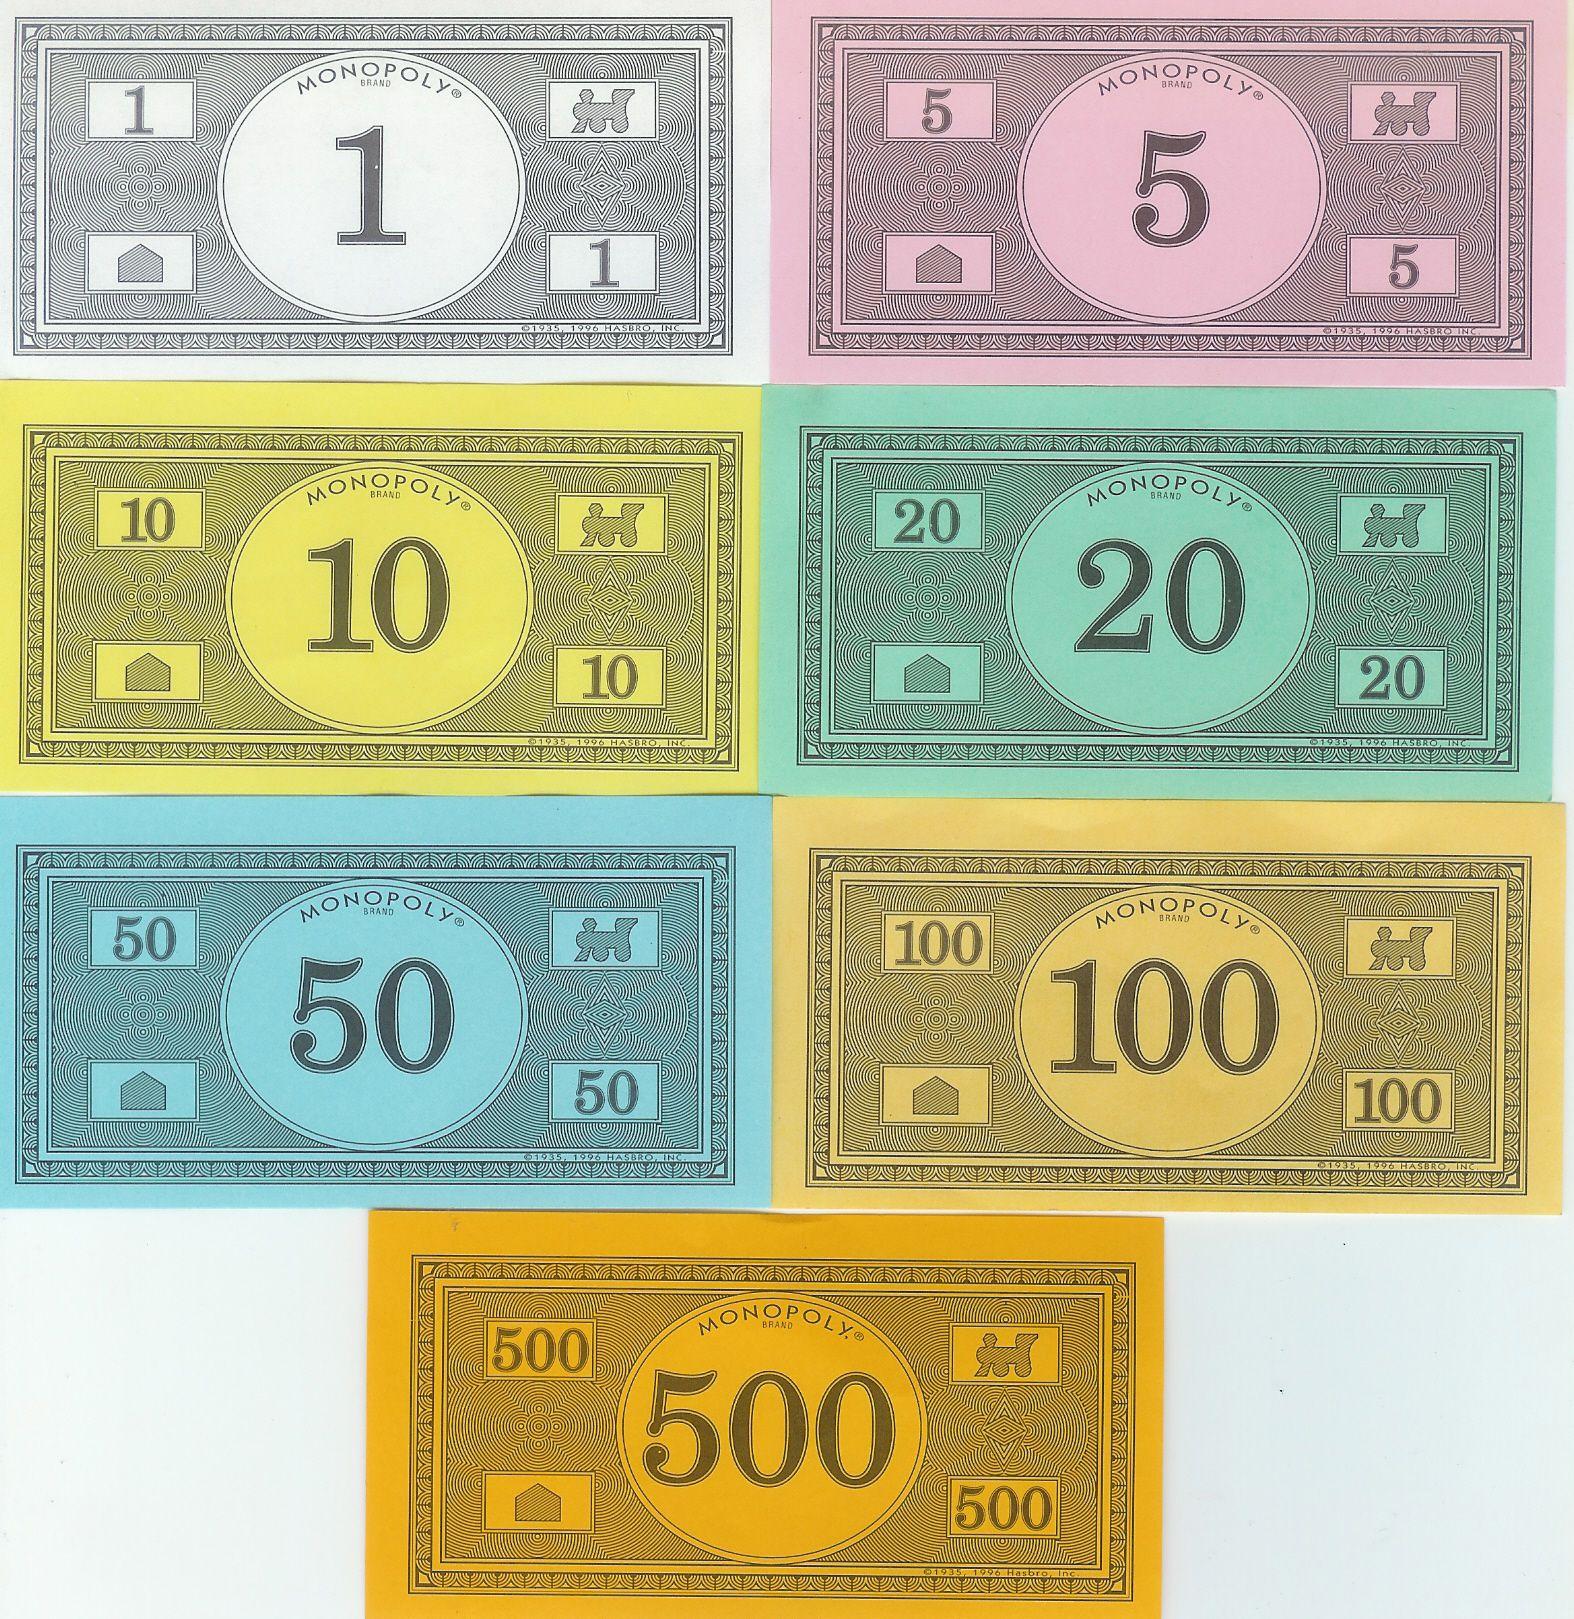 Monopoly Money Templates Free Invitation Templates Library Ideas regarding measurements 1574 X 1619